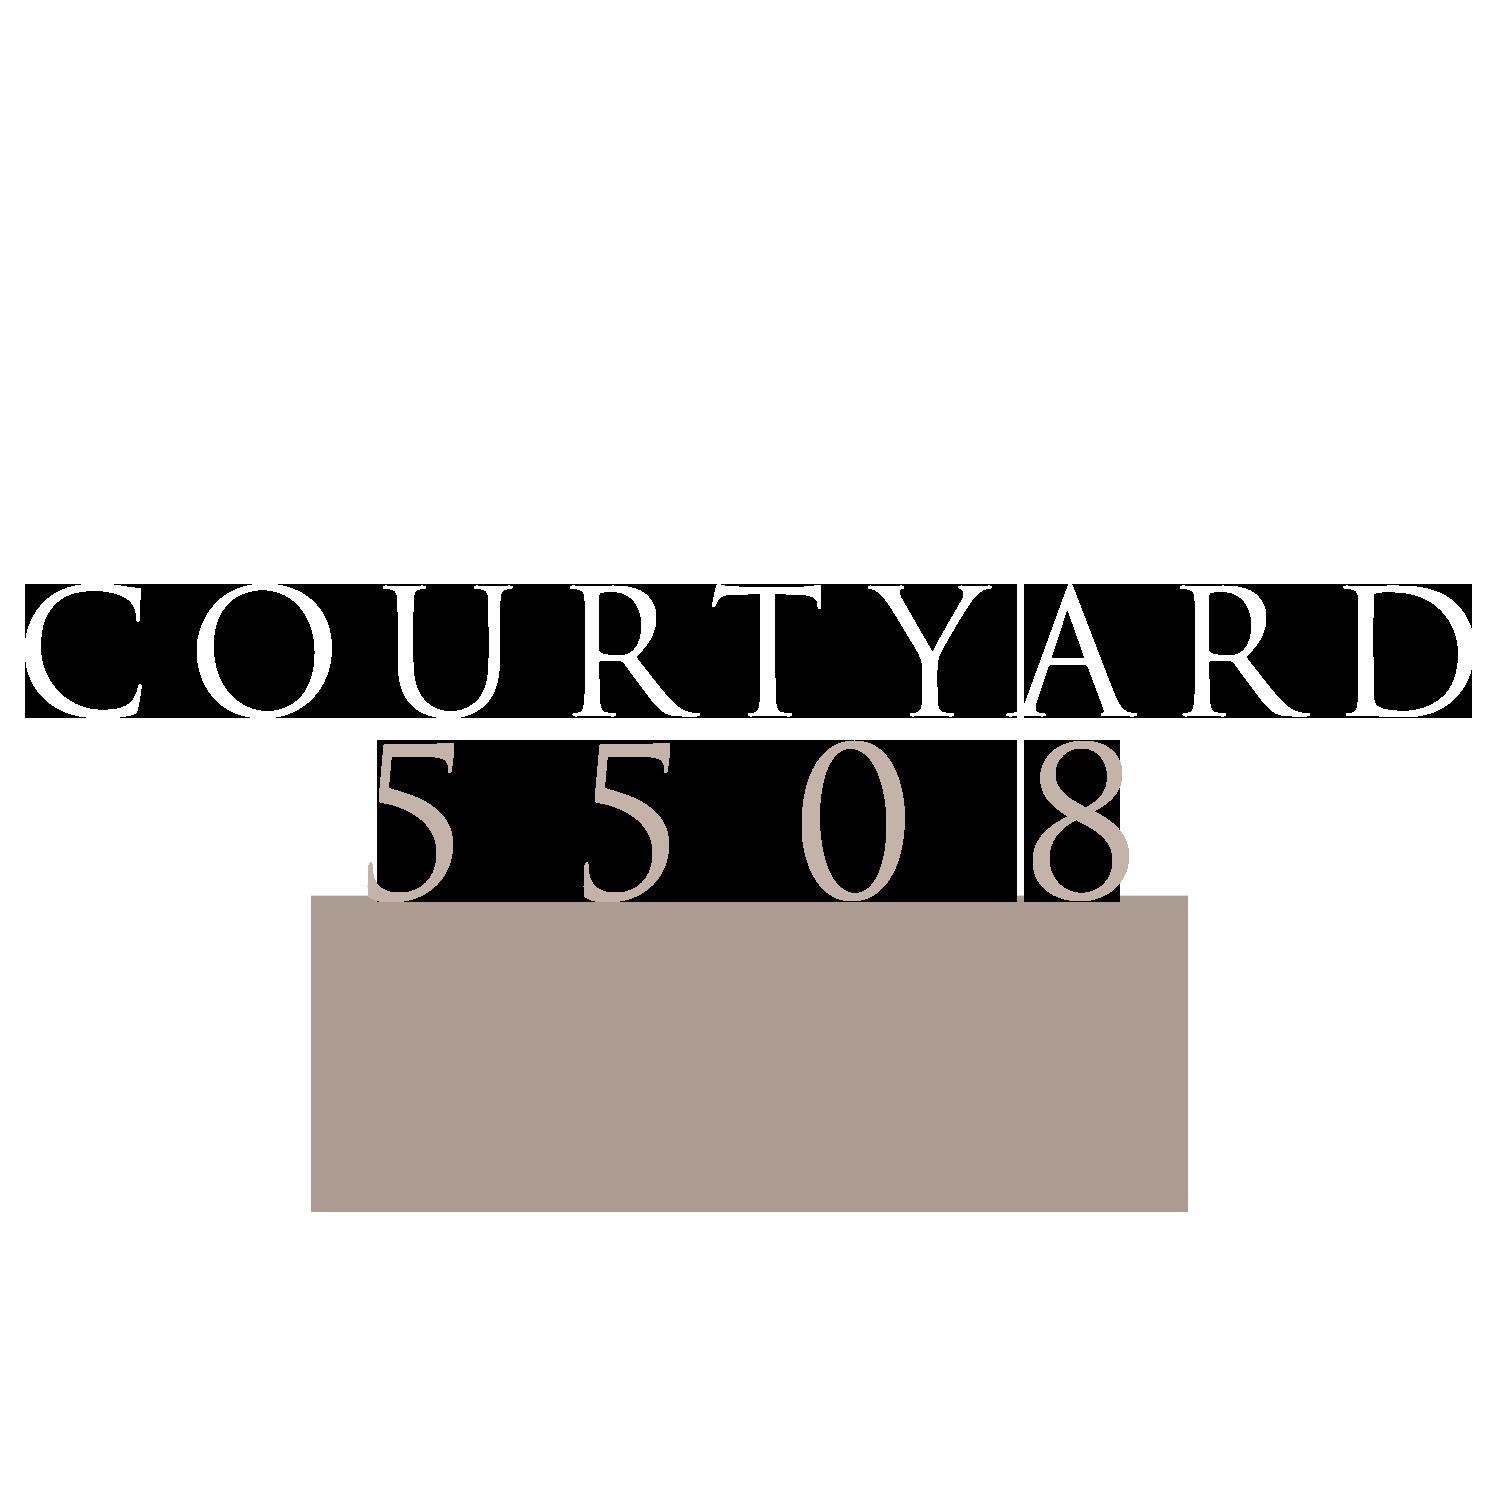 Courtyard 5508